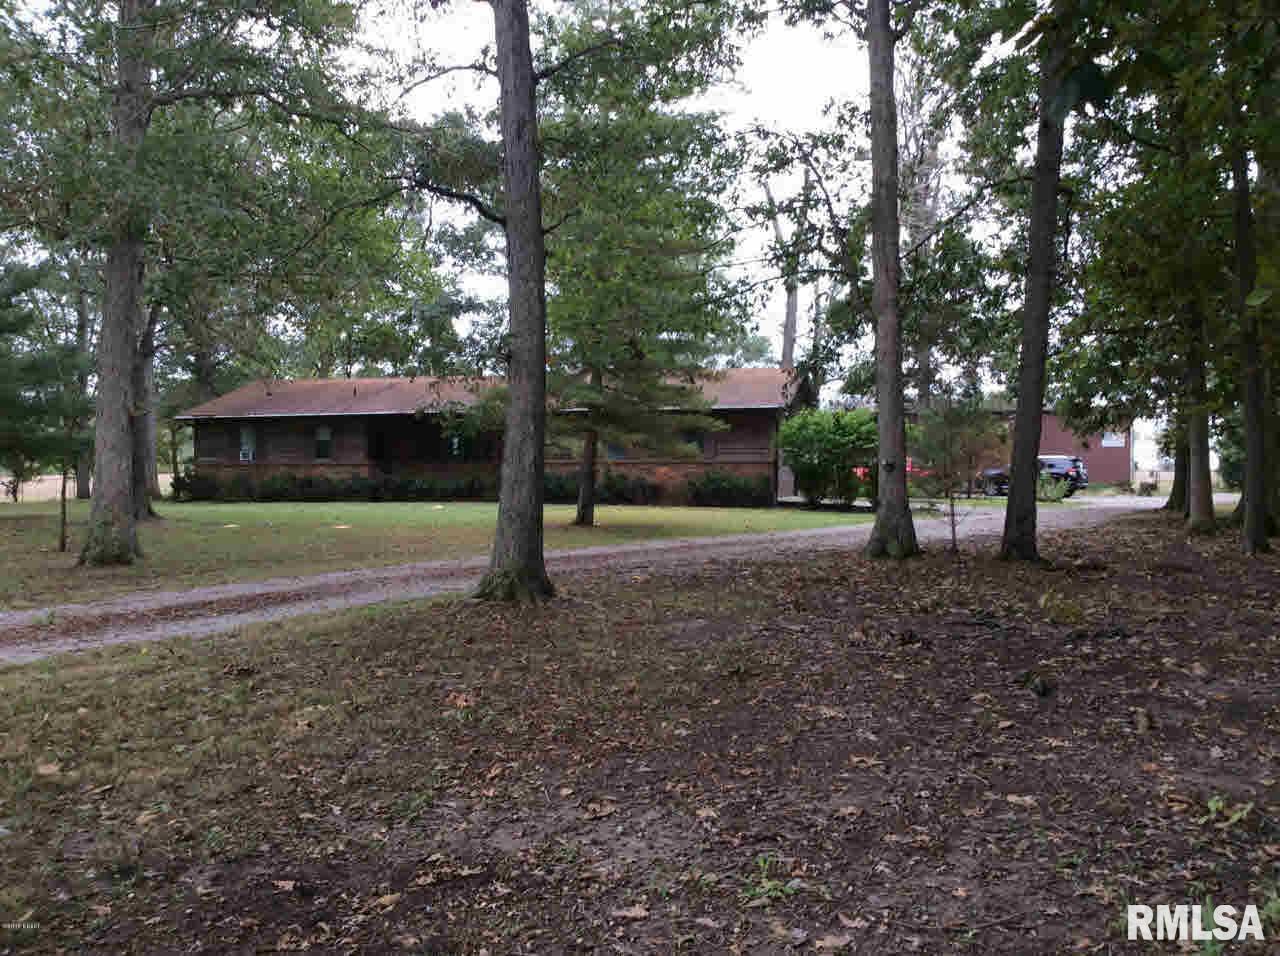 4295 E Houston Property Photo - Woodlawn, IL real estate listing